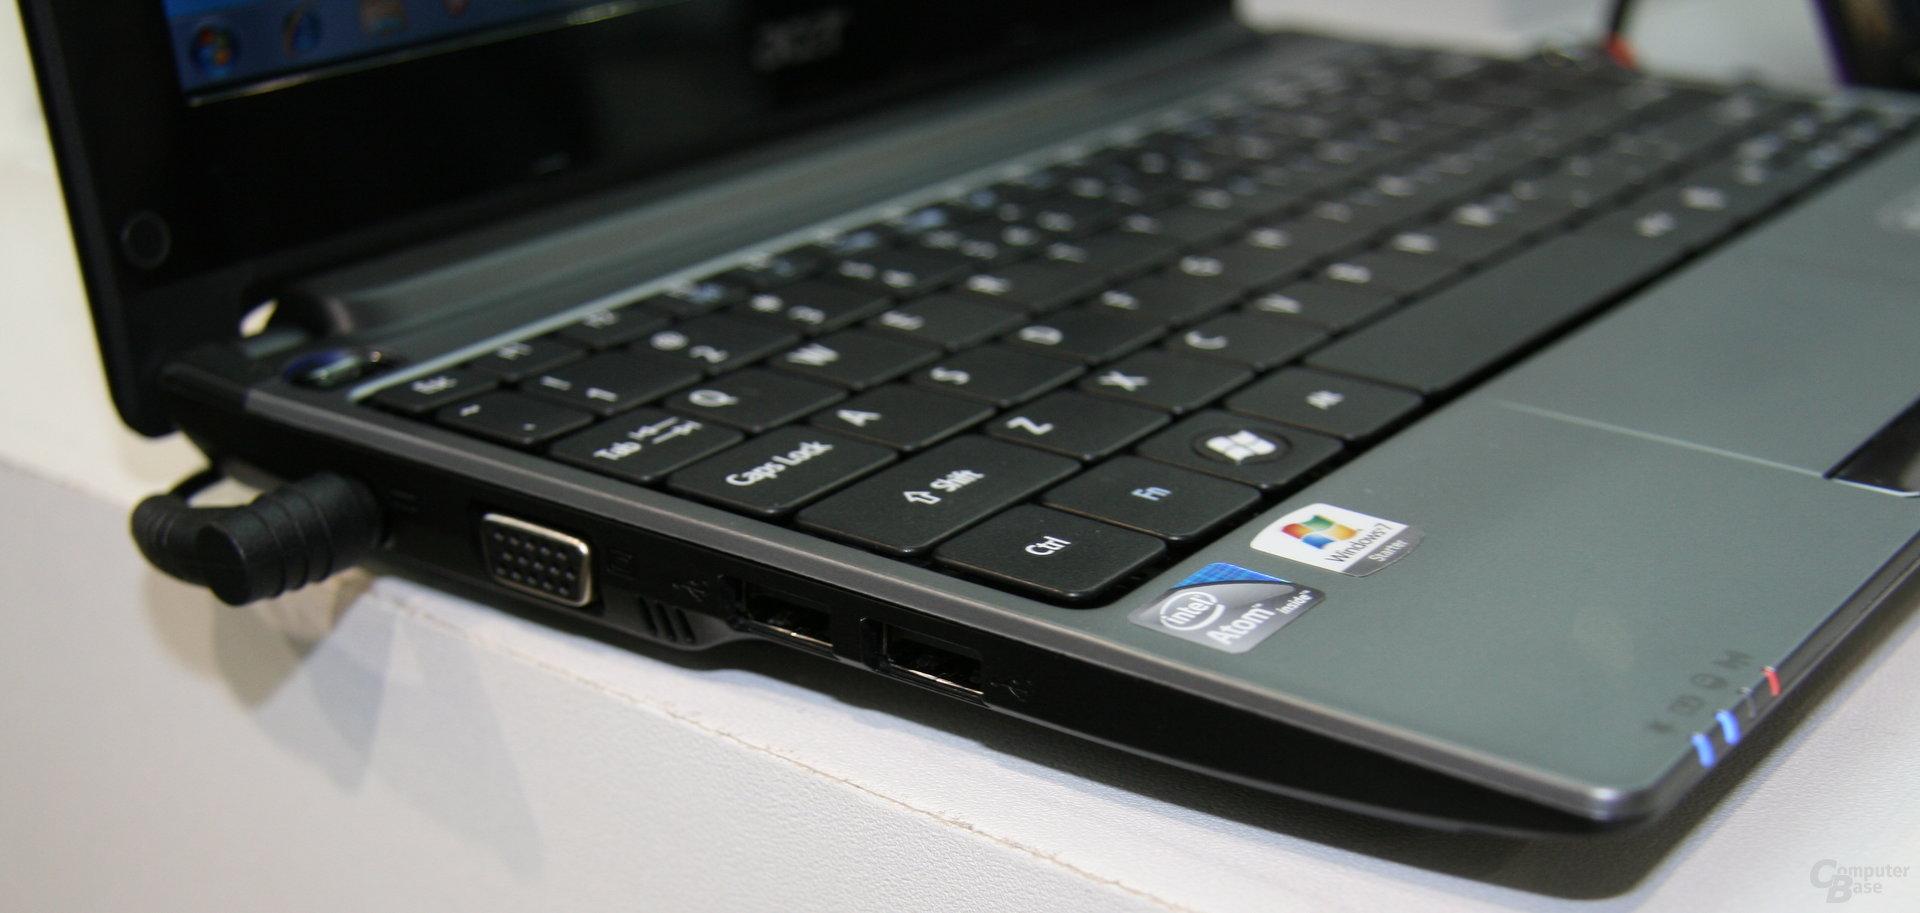 Acer Asprire One D260